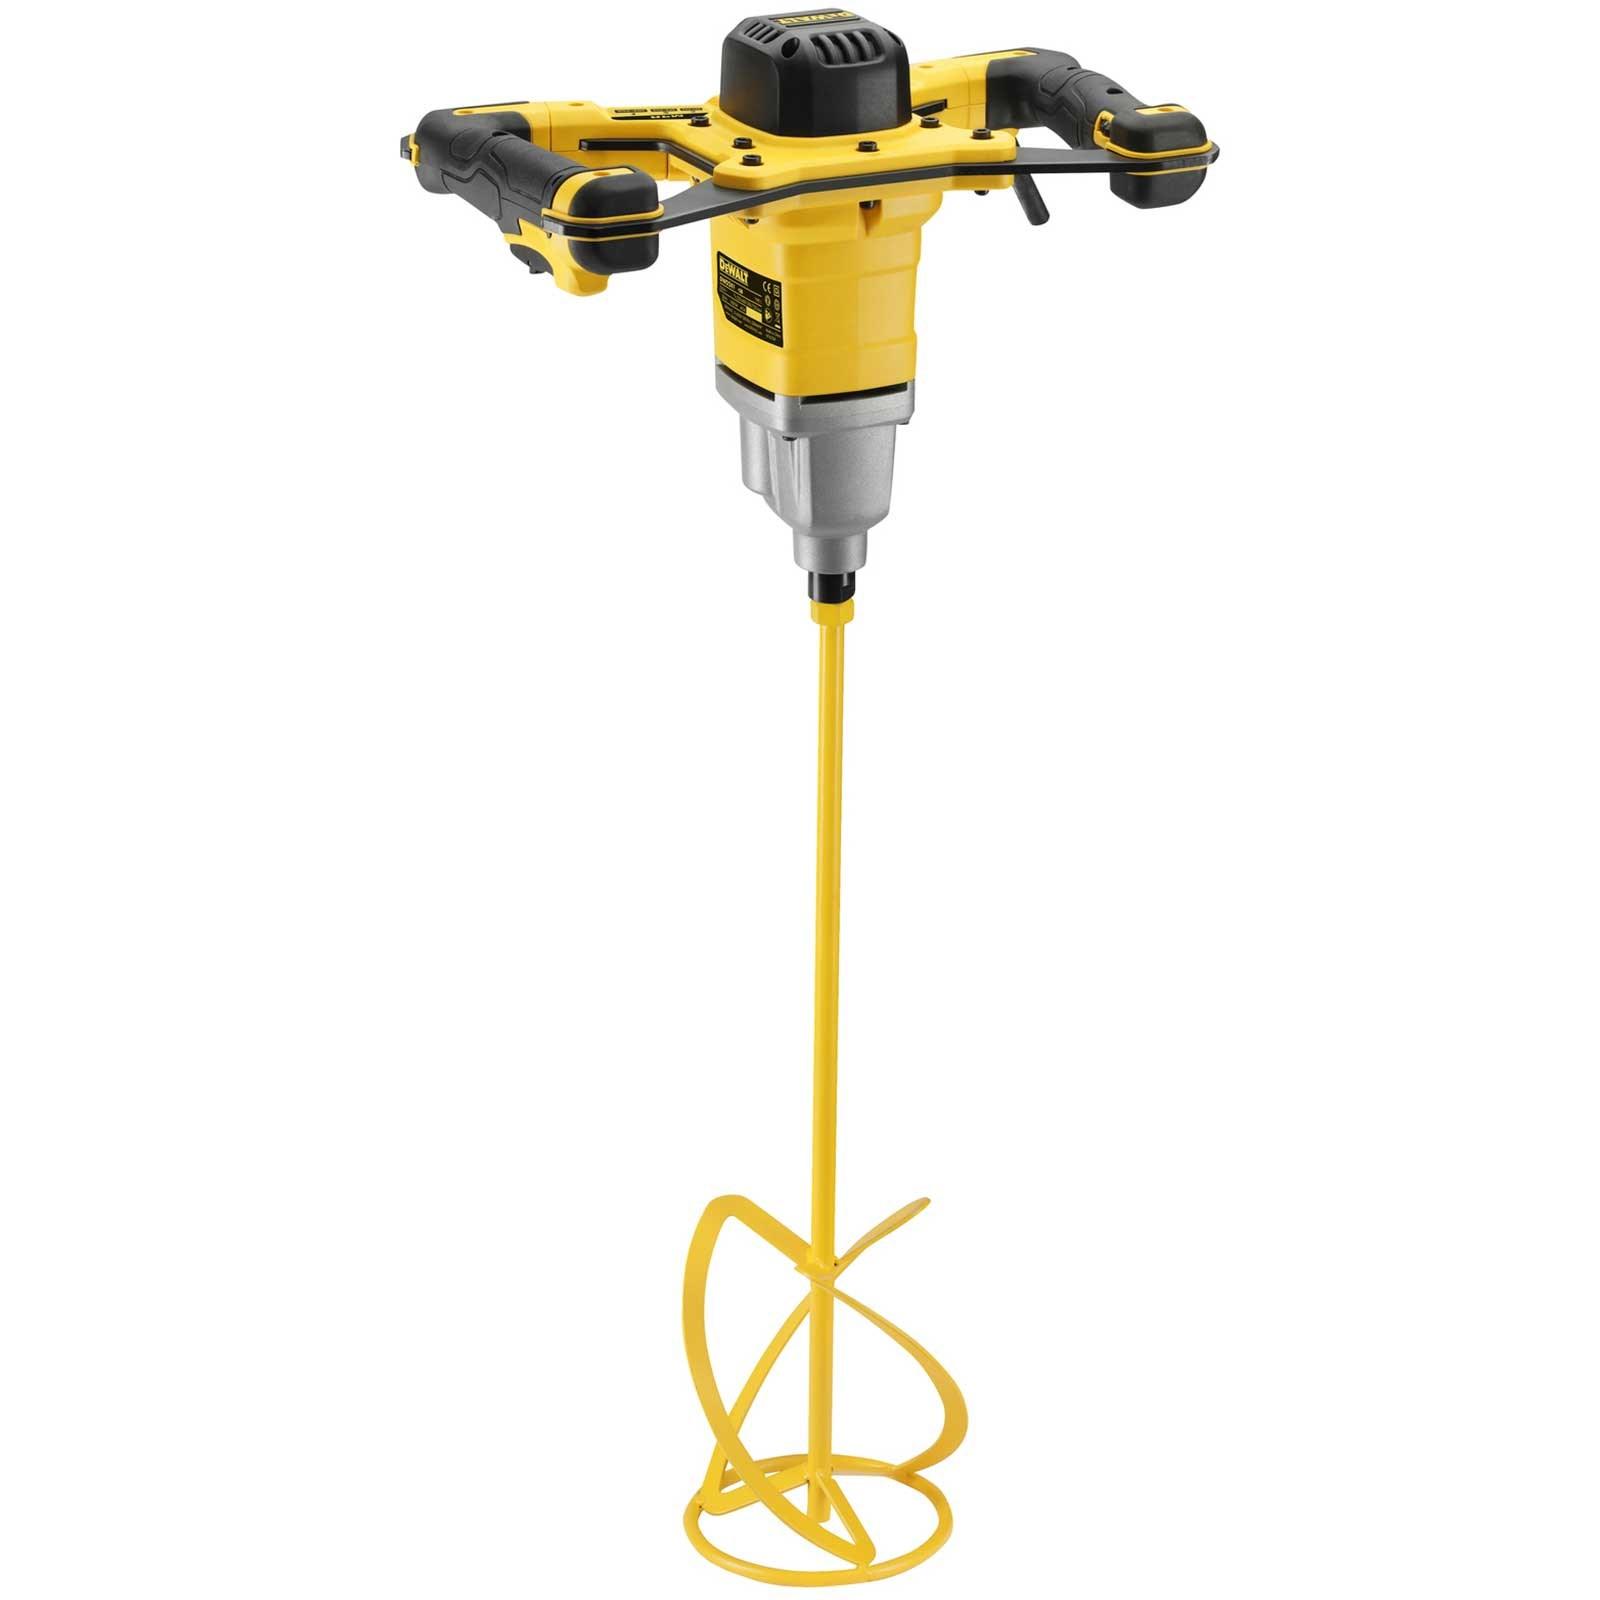 Dewalt_DWD241-LX_Paddle Mixer